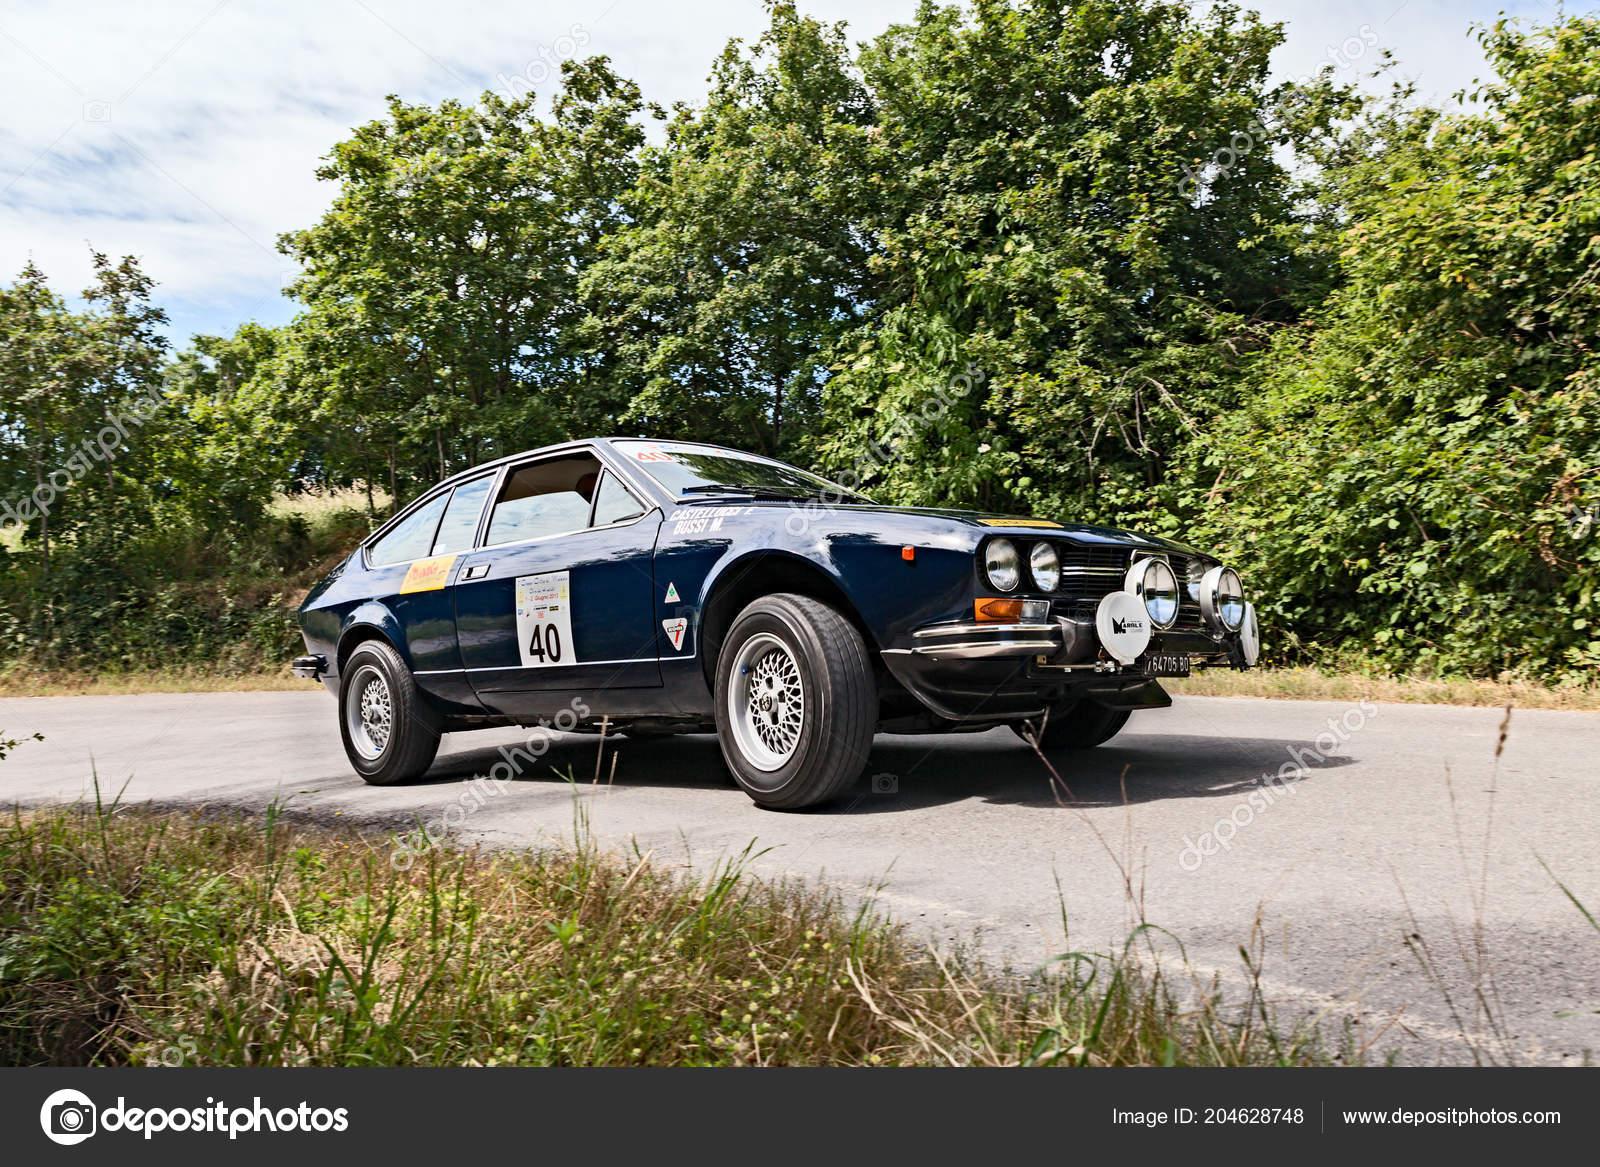 Vintage Car Alfa Romeo Gtv 2000 1978 Runs Rally Old – Stock ...